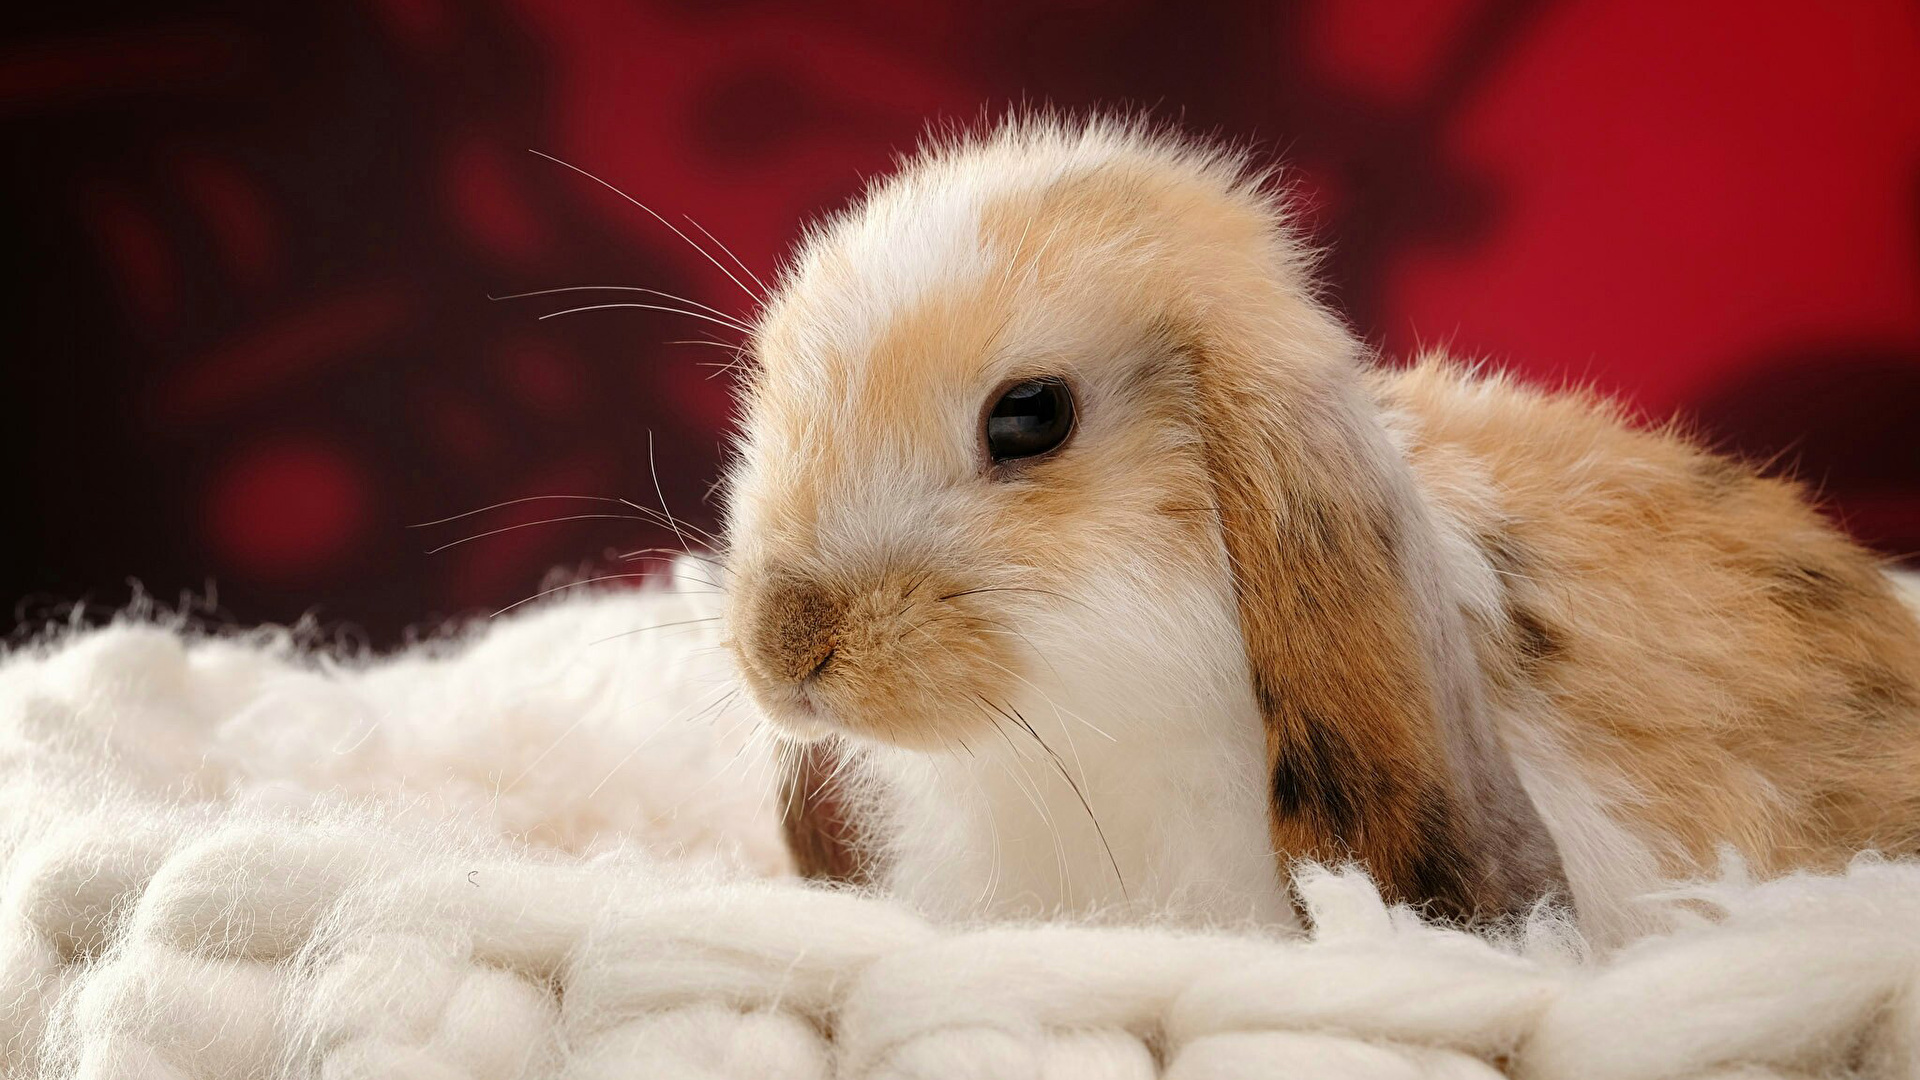 1920x1080,兔,头,動物,